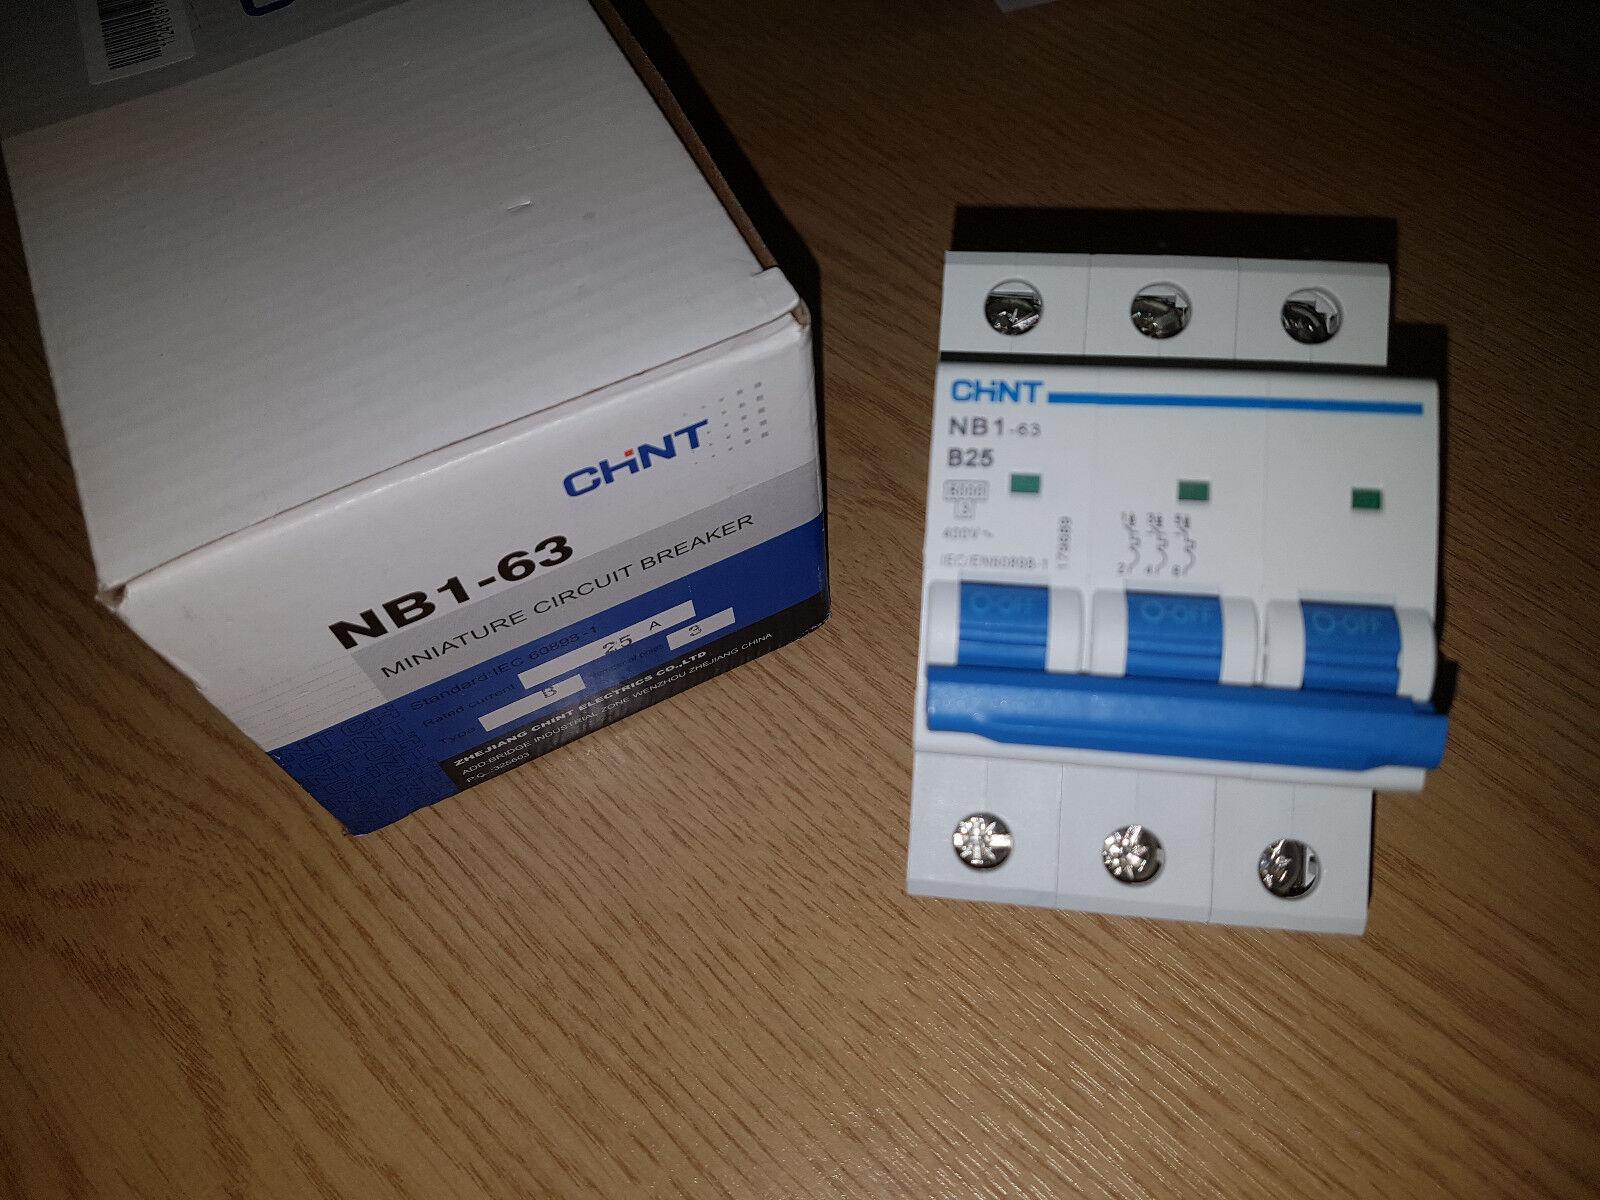 Chint Mcb Type C Three Pole 20 Amp Miniture Circuit Breaker Ebay Miniature Norton Secured Powered By Verisign